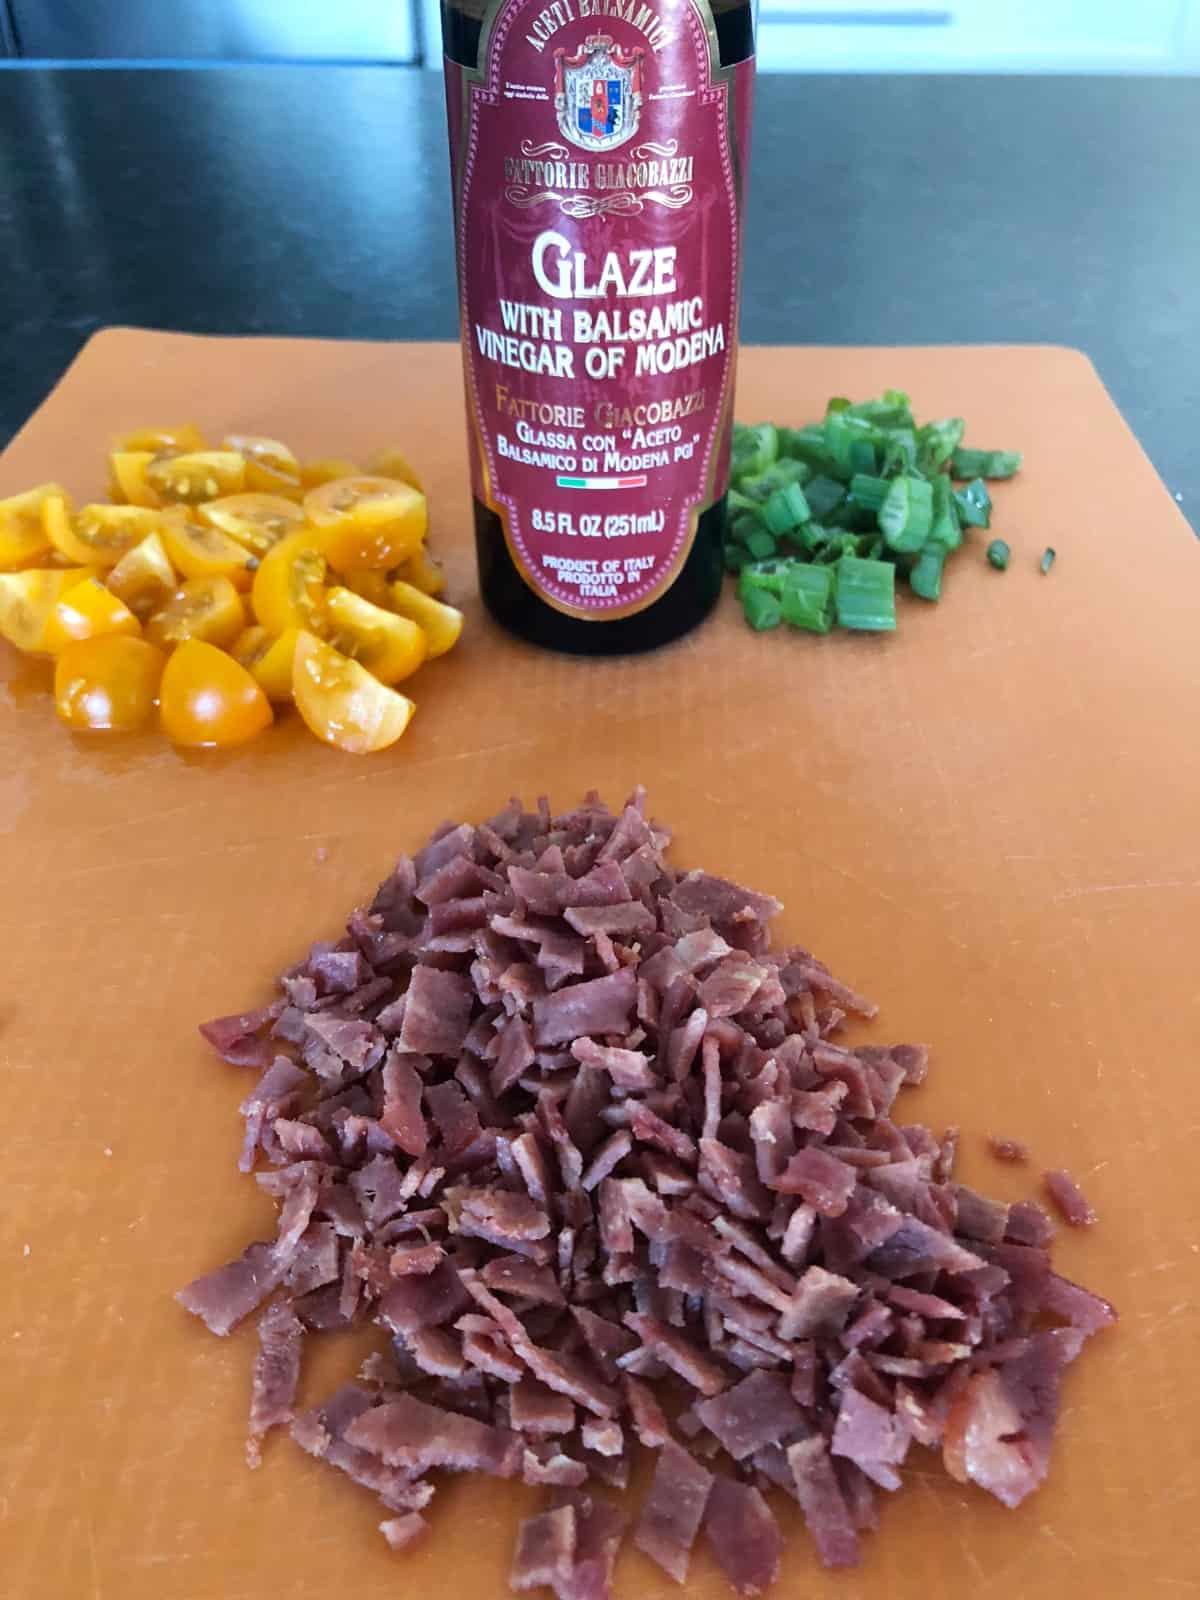 Chopped tomatoes, sliced green onion, chopped turkey bacon, balsamic glaze on orange cutting mat.